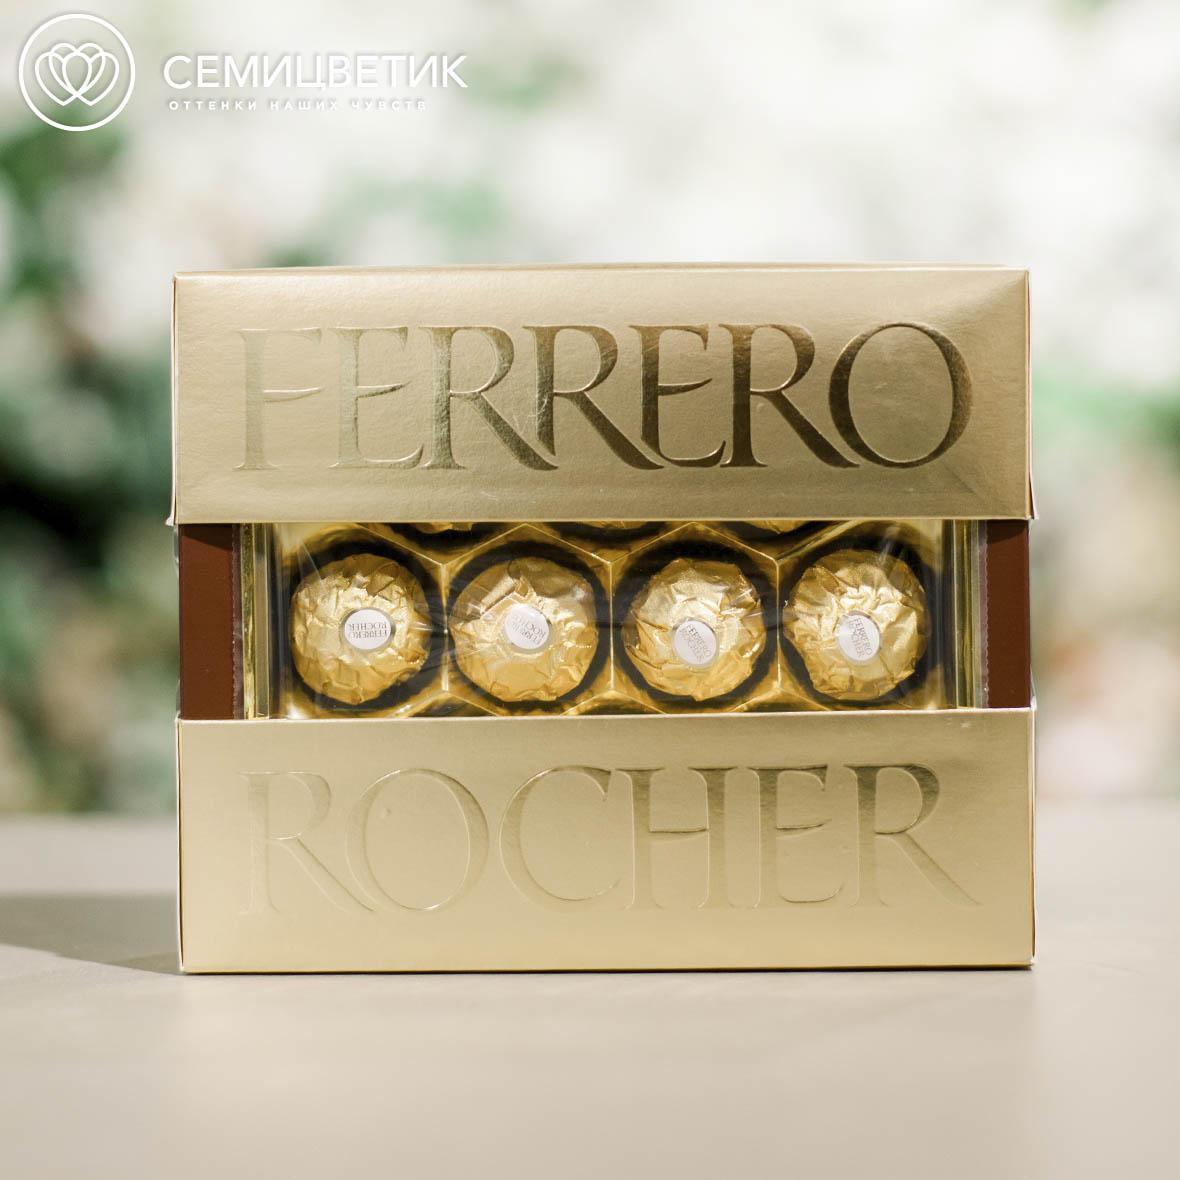 Конфеты Ferrero Rocher в ассортименте 125 гр. фото